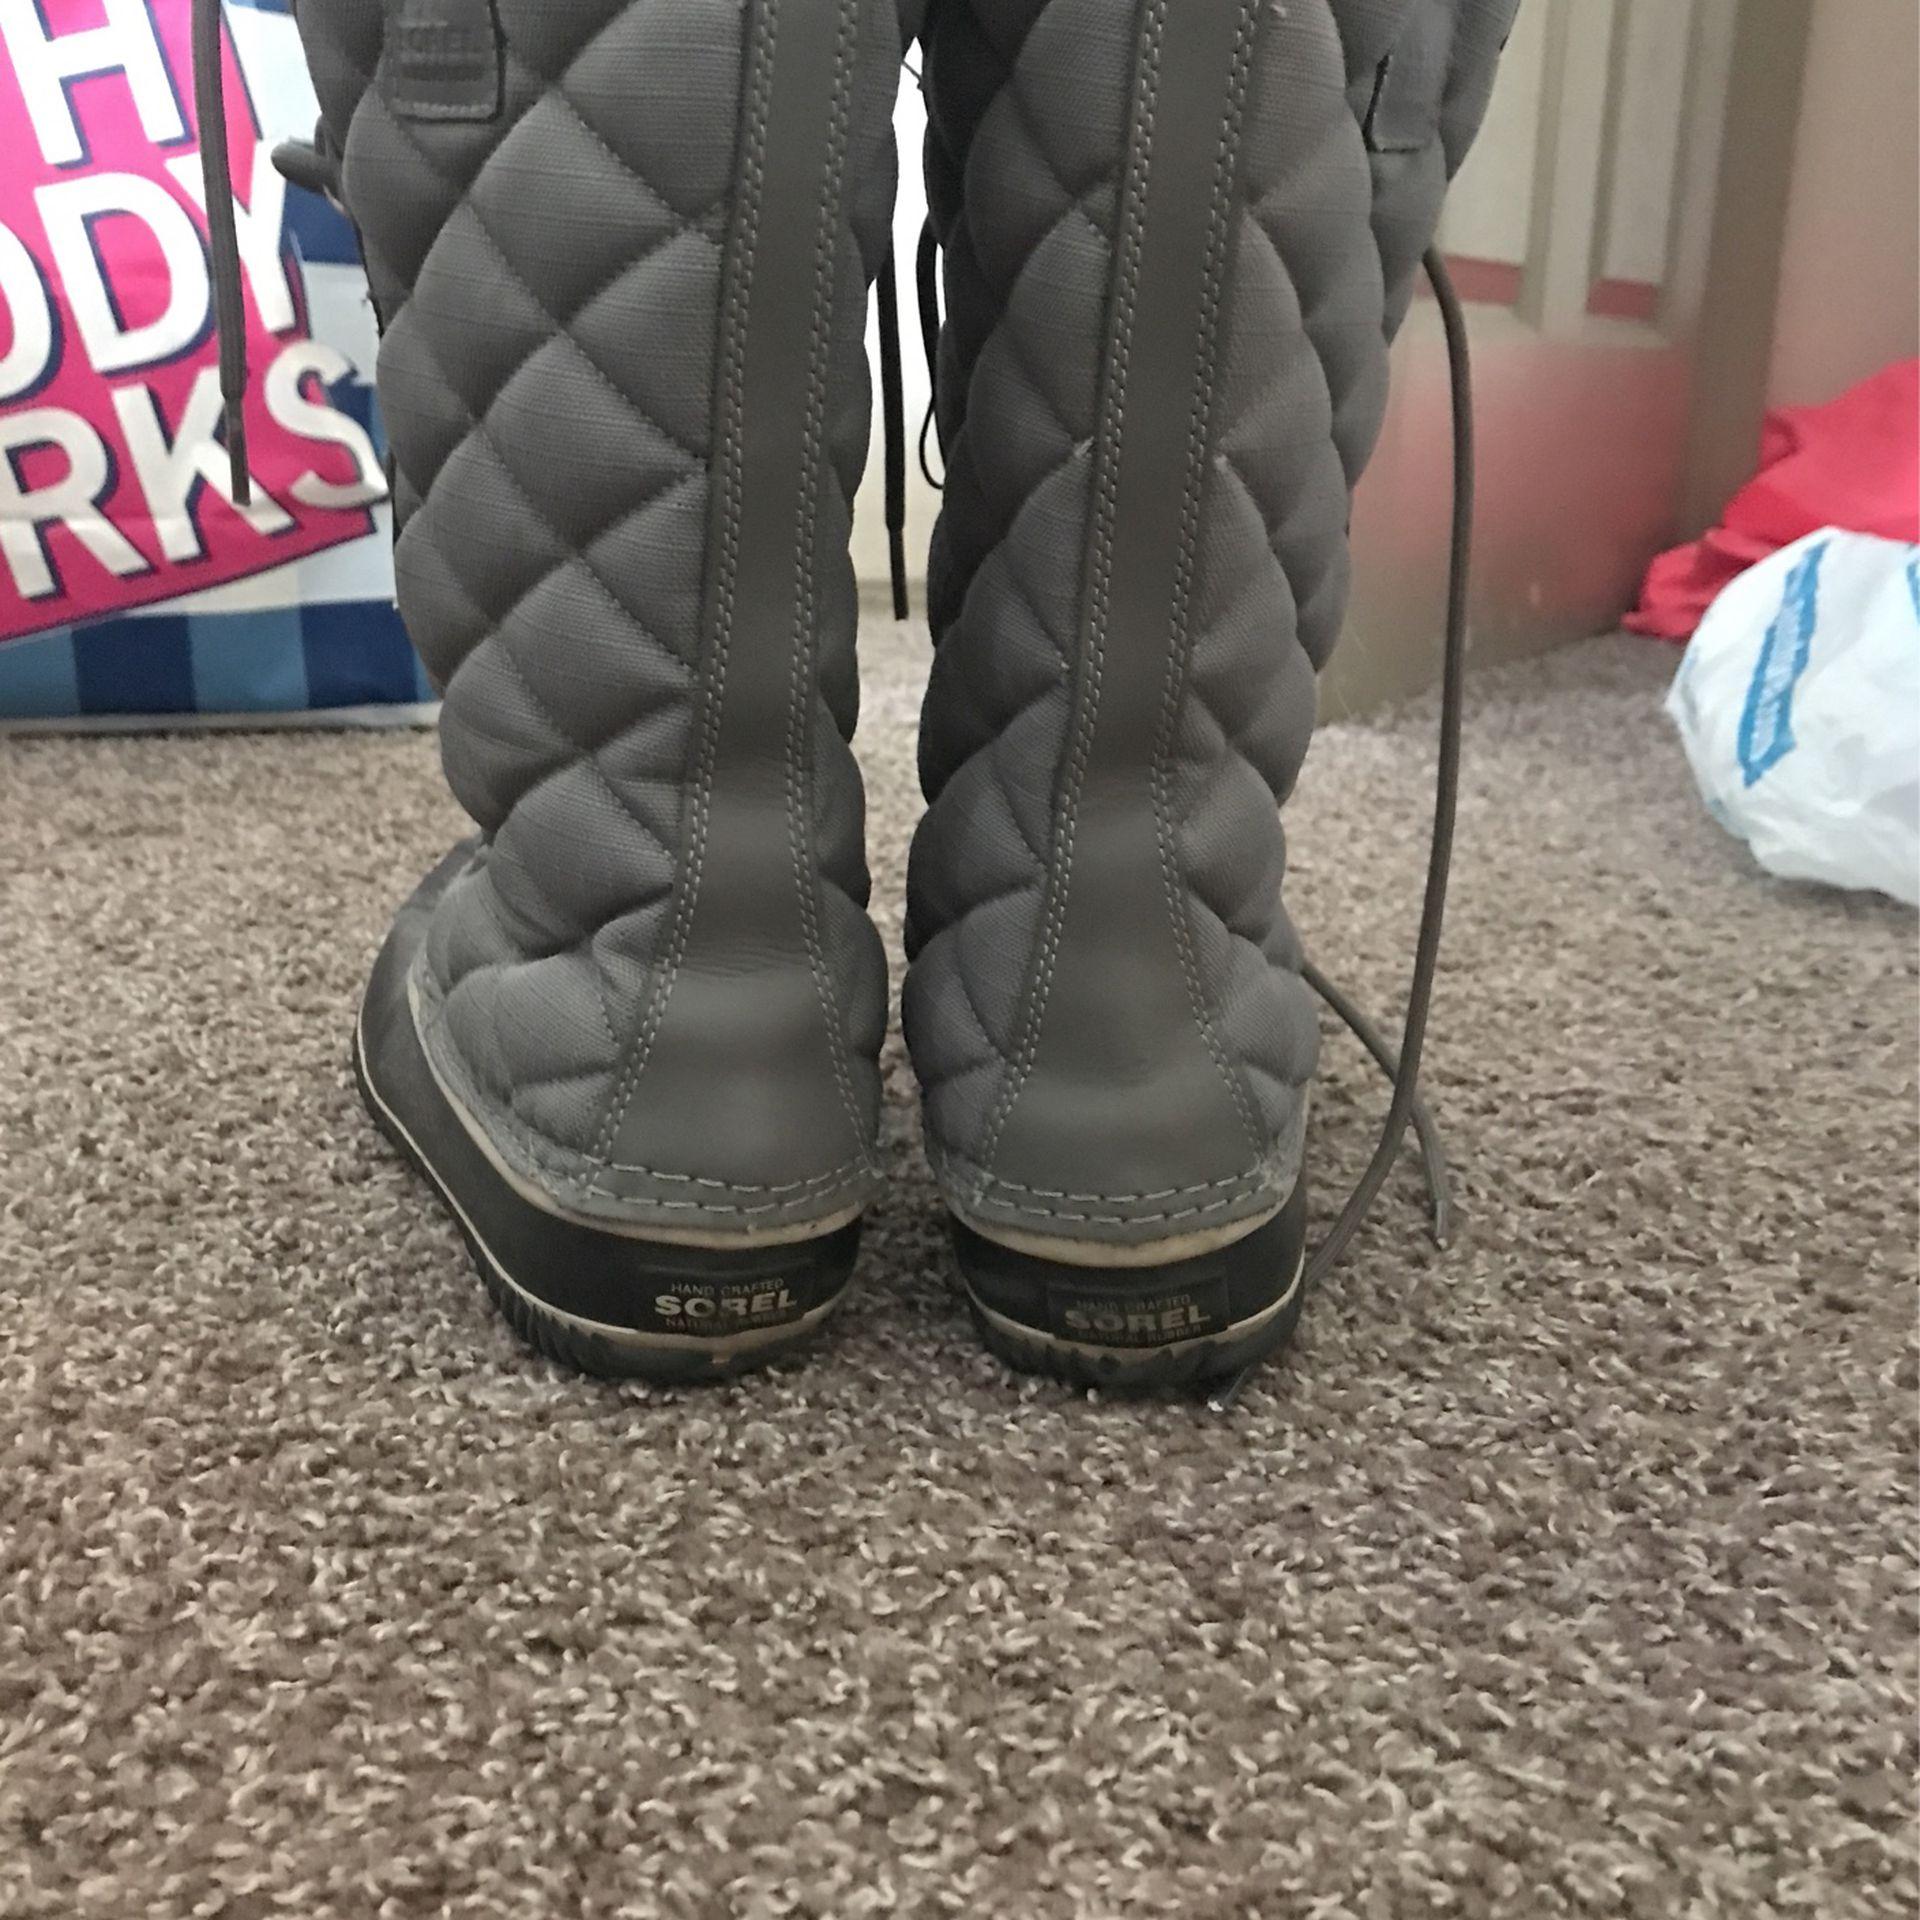 10.5 Snow boots